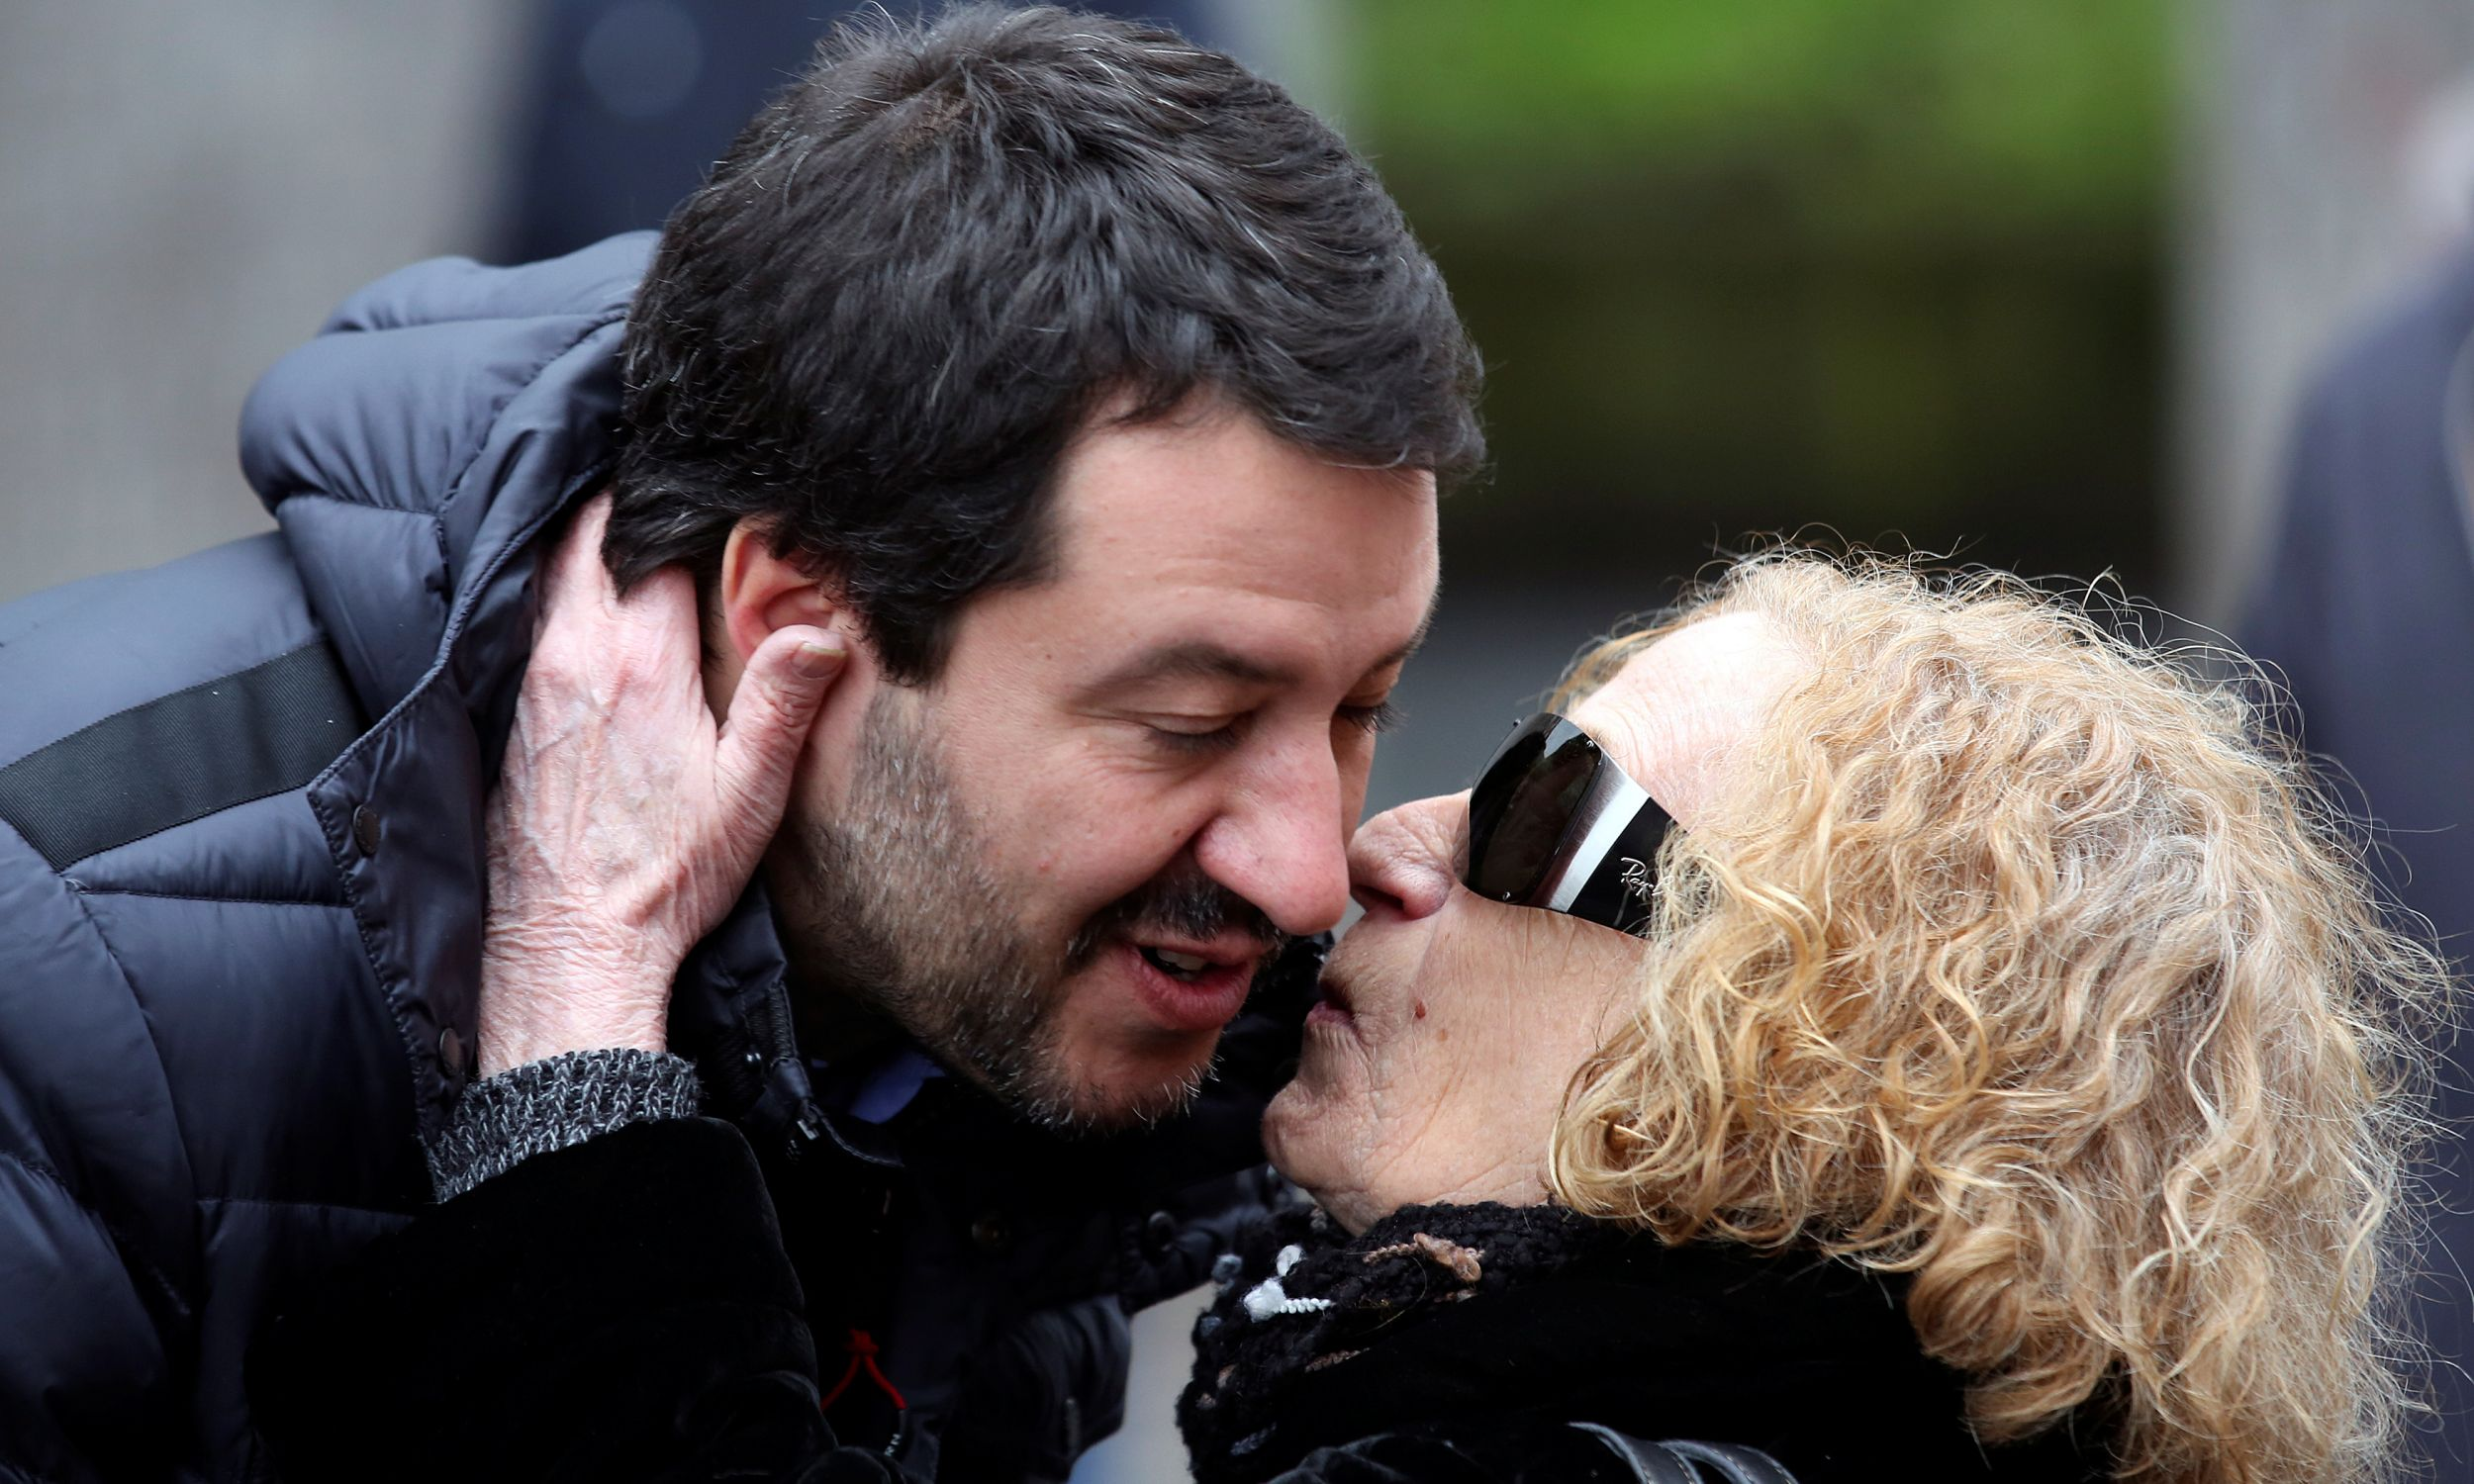 Wiec w Mediolanie, marzec 2018 r. Fot. REUTERS/Stefano Rellandini